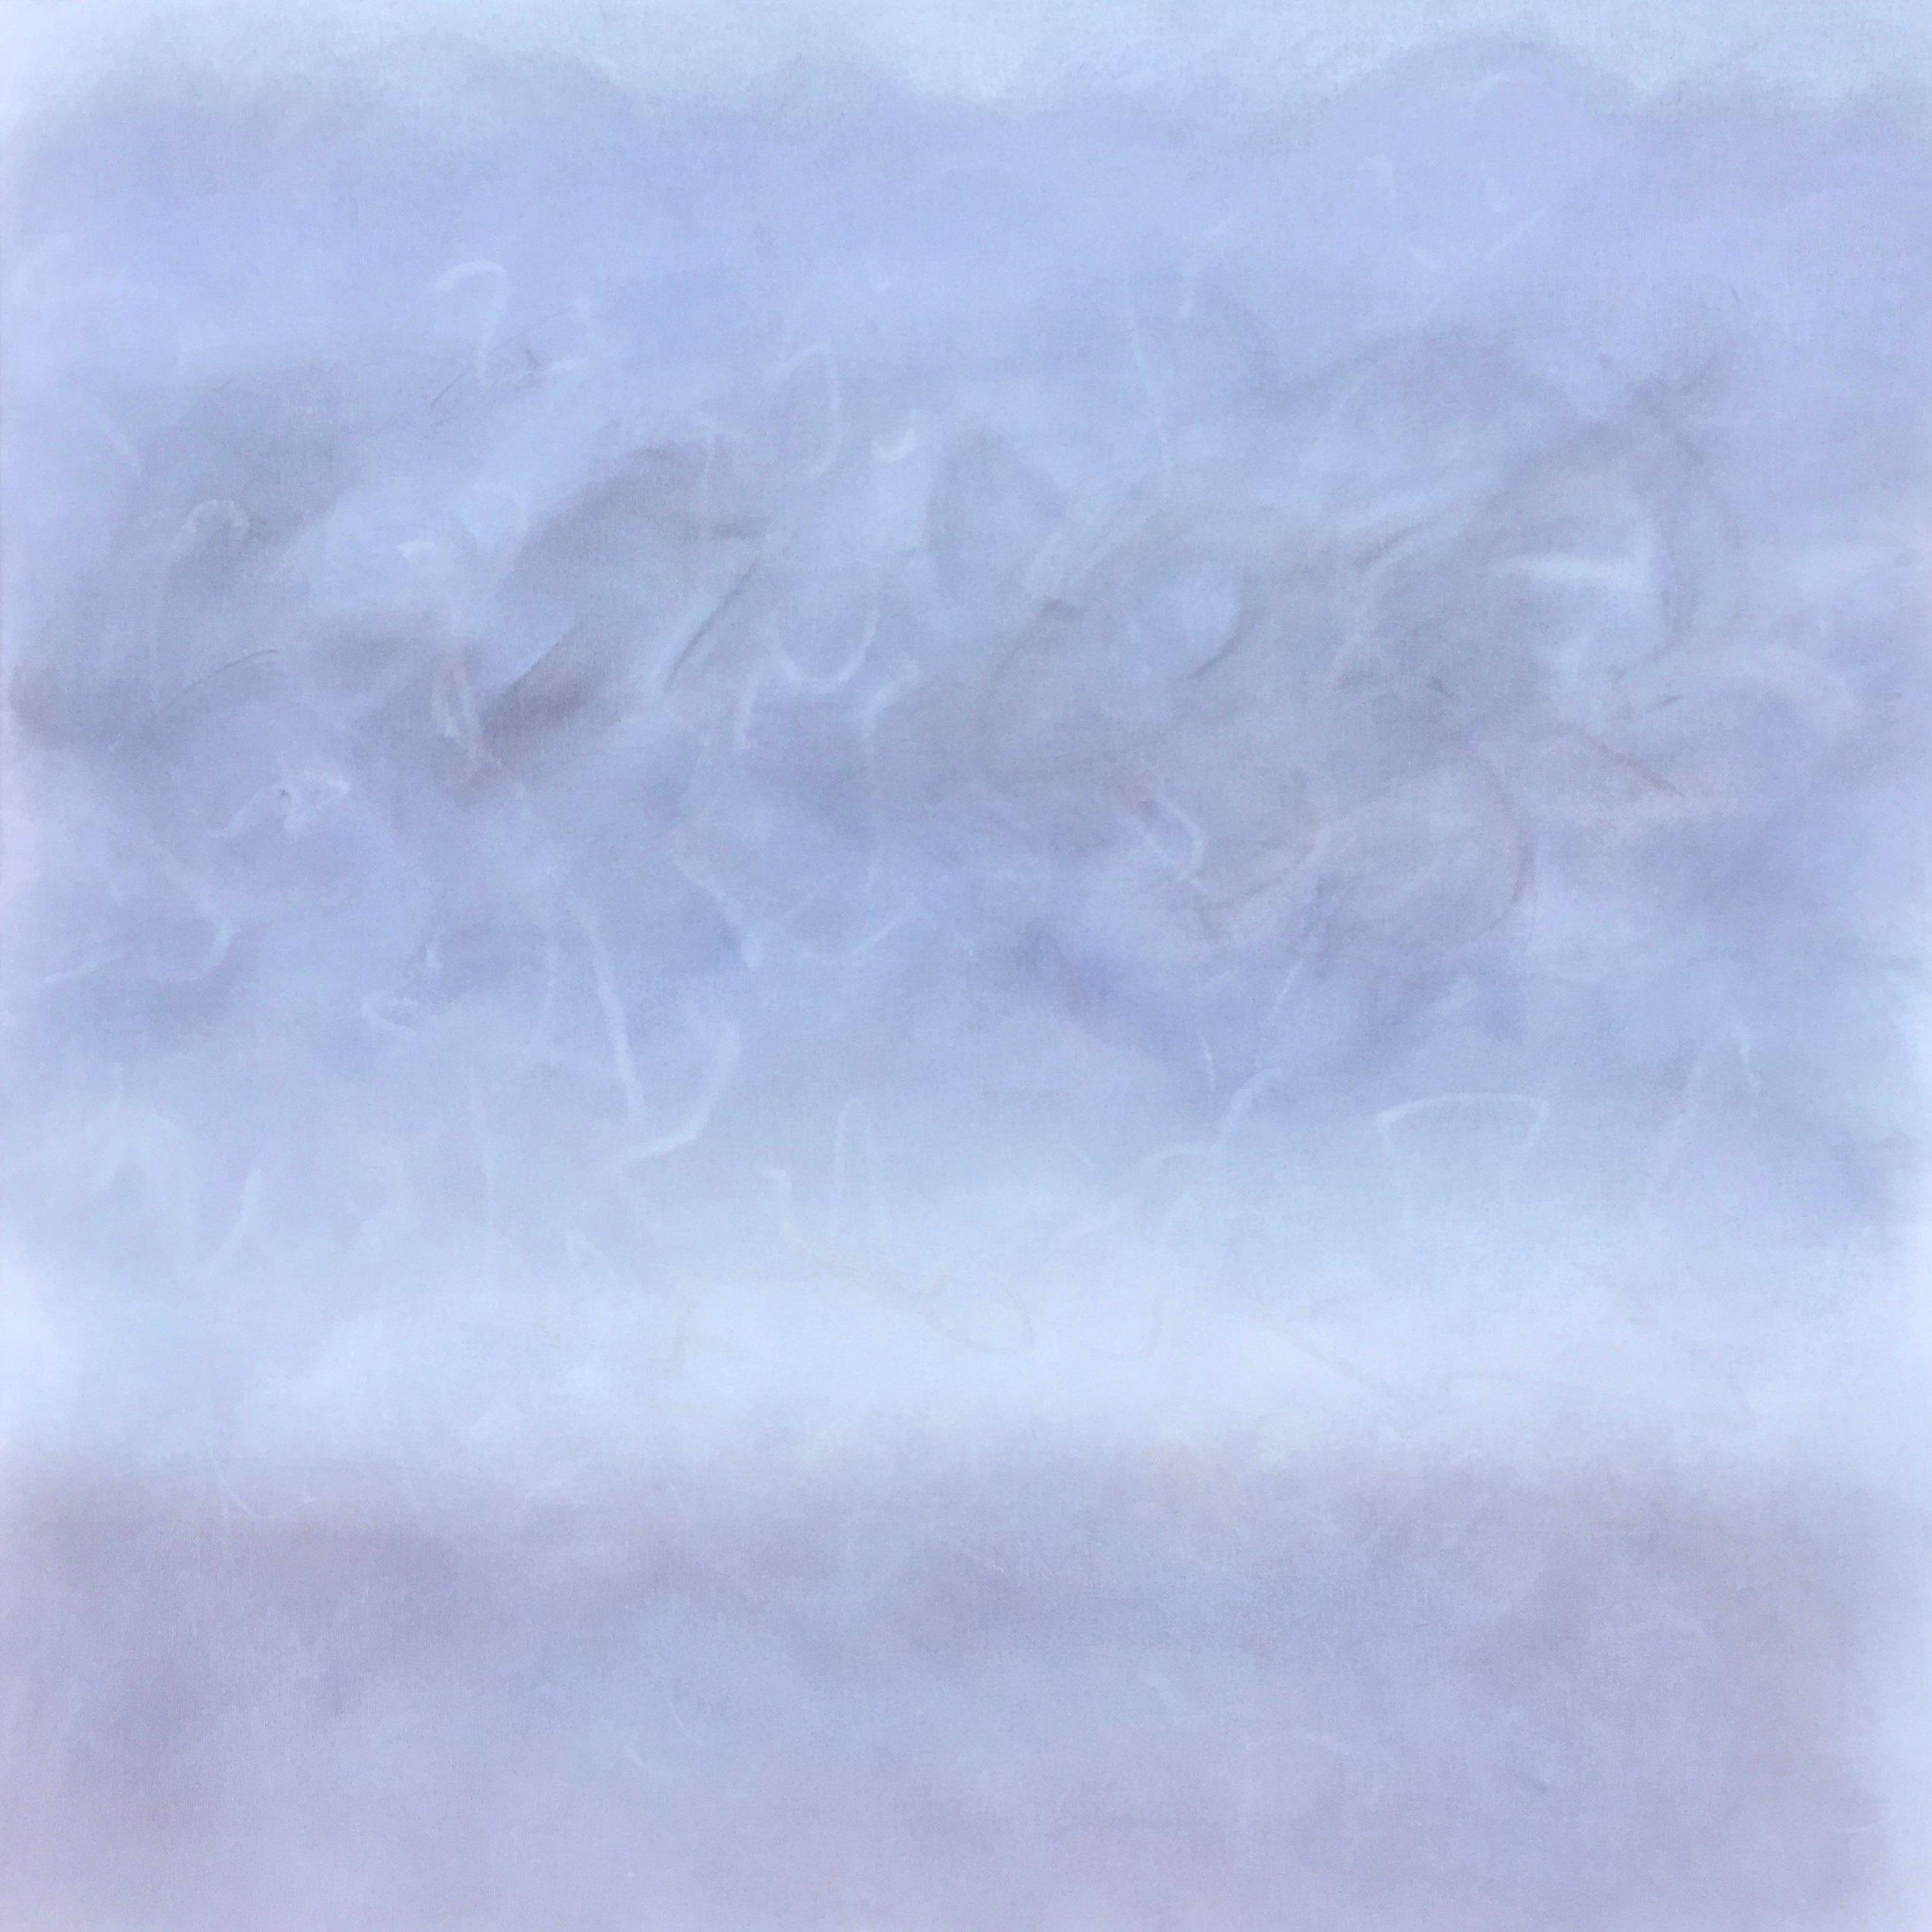 Napeague Shoals II, by Roisin Bateman, 2016, oil on canvas,  34 x 34 in, $3600